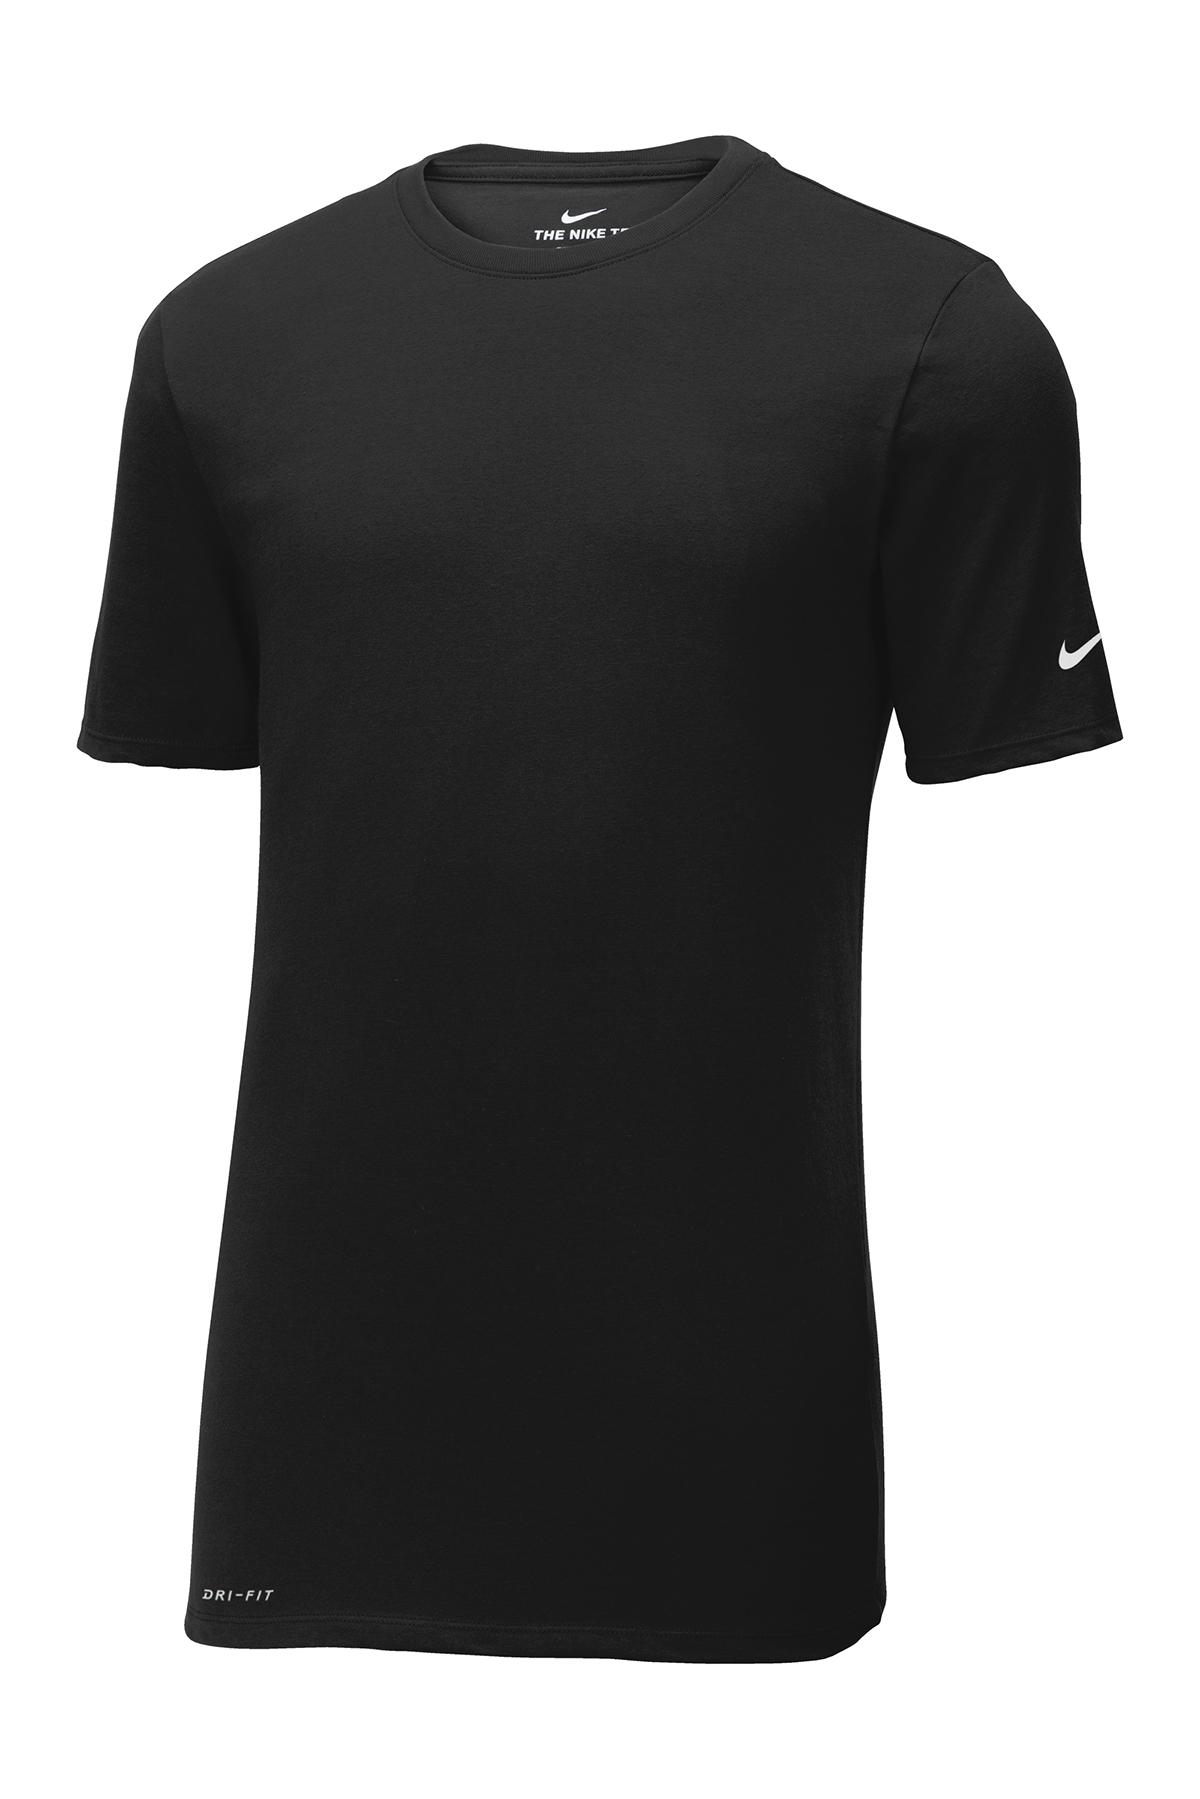 Cottonpoly Nike Performance T Tee Dri Fit Sanmar Shirts EqnAqr